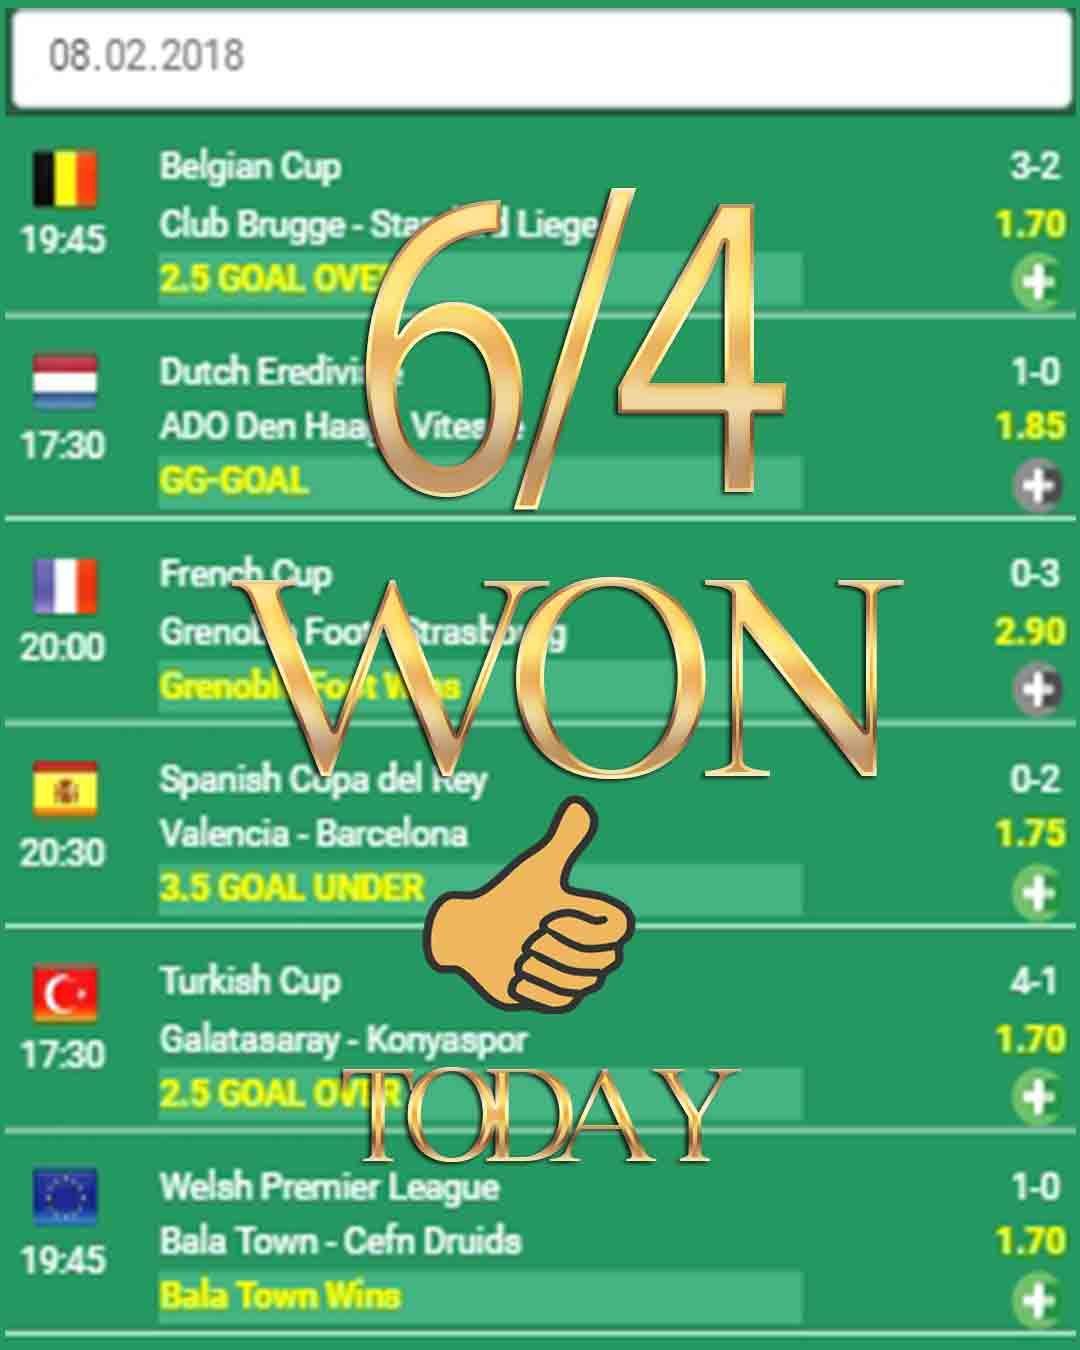 tipico live betting